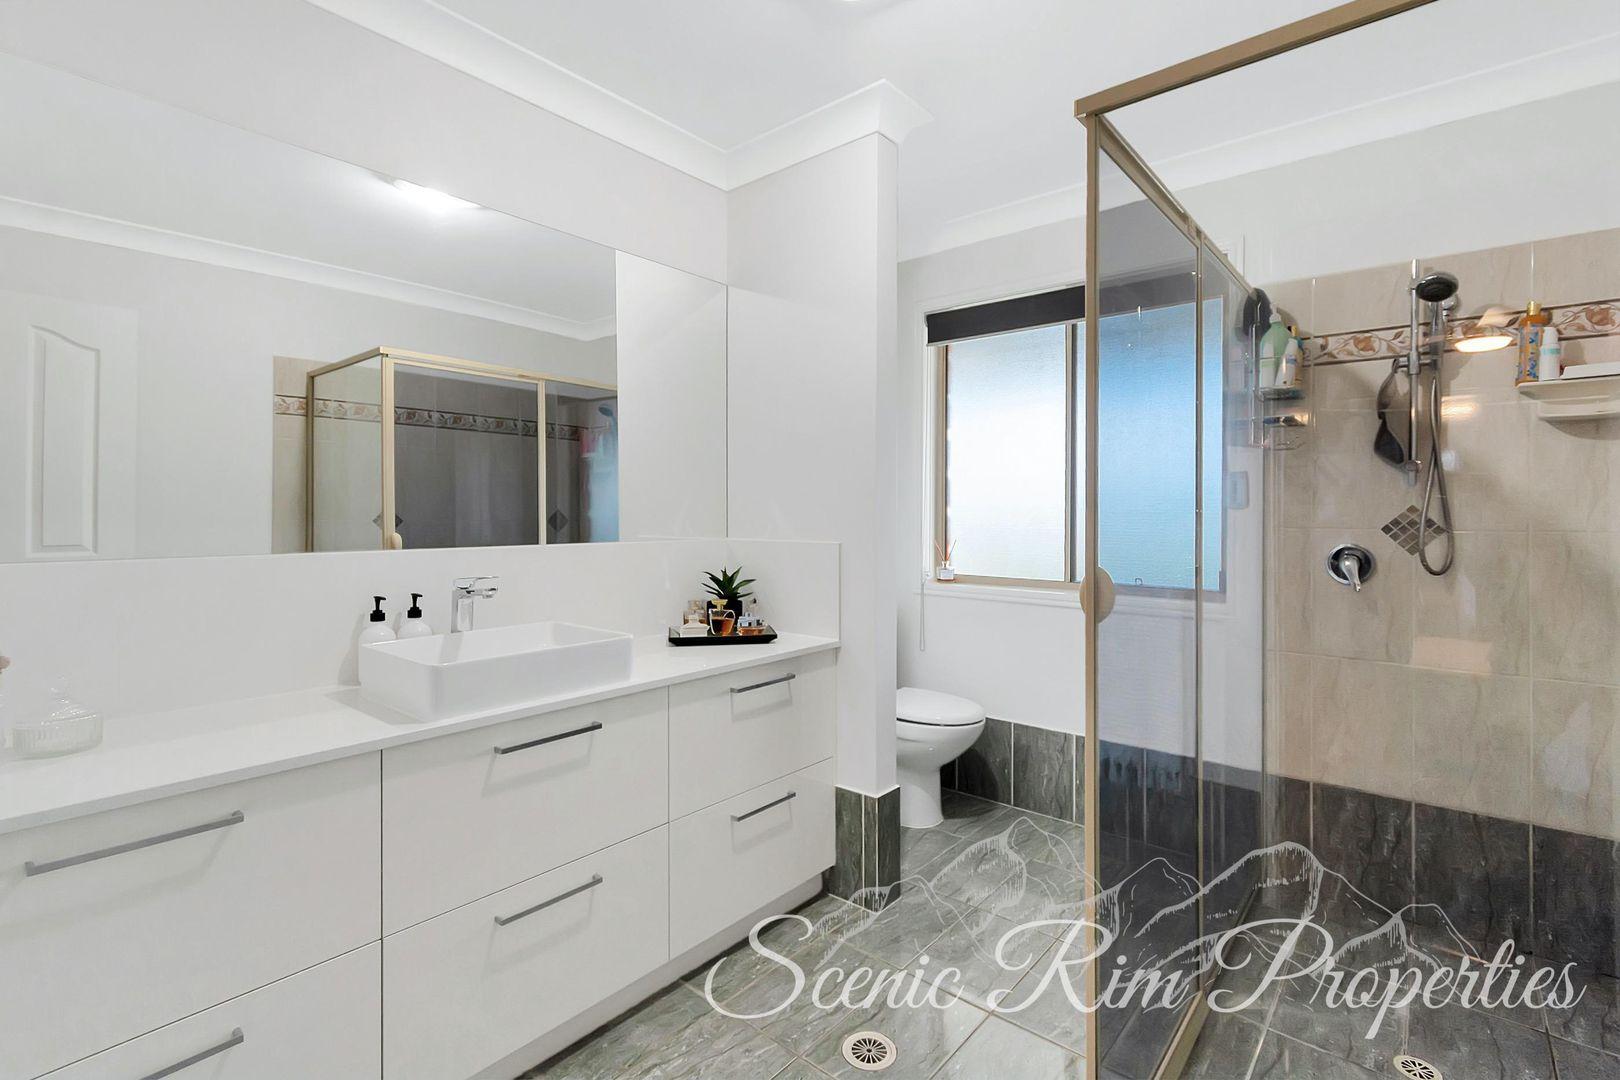 521 Munbilla Road, Munbilla QLD 4309, Image 2